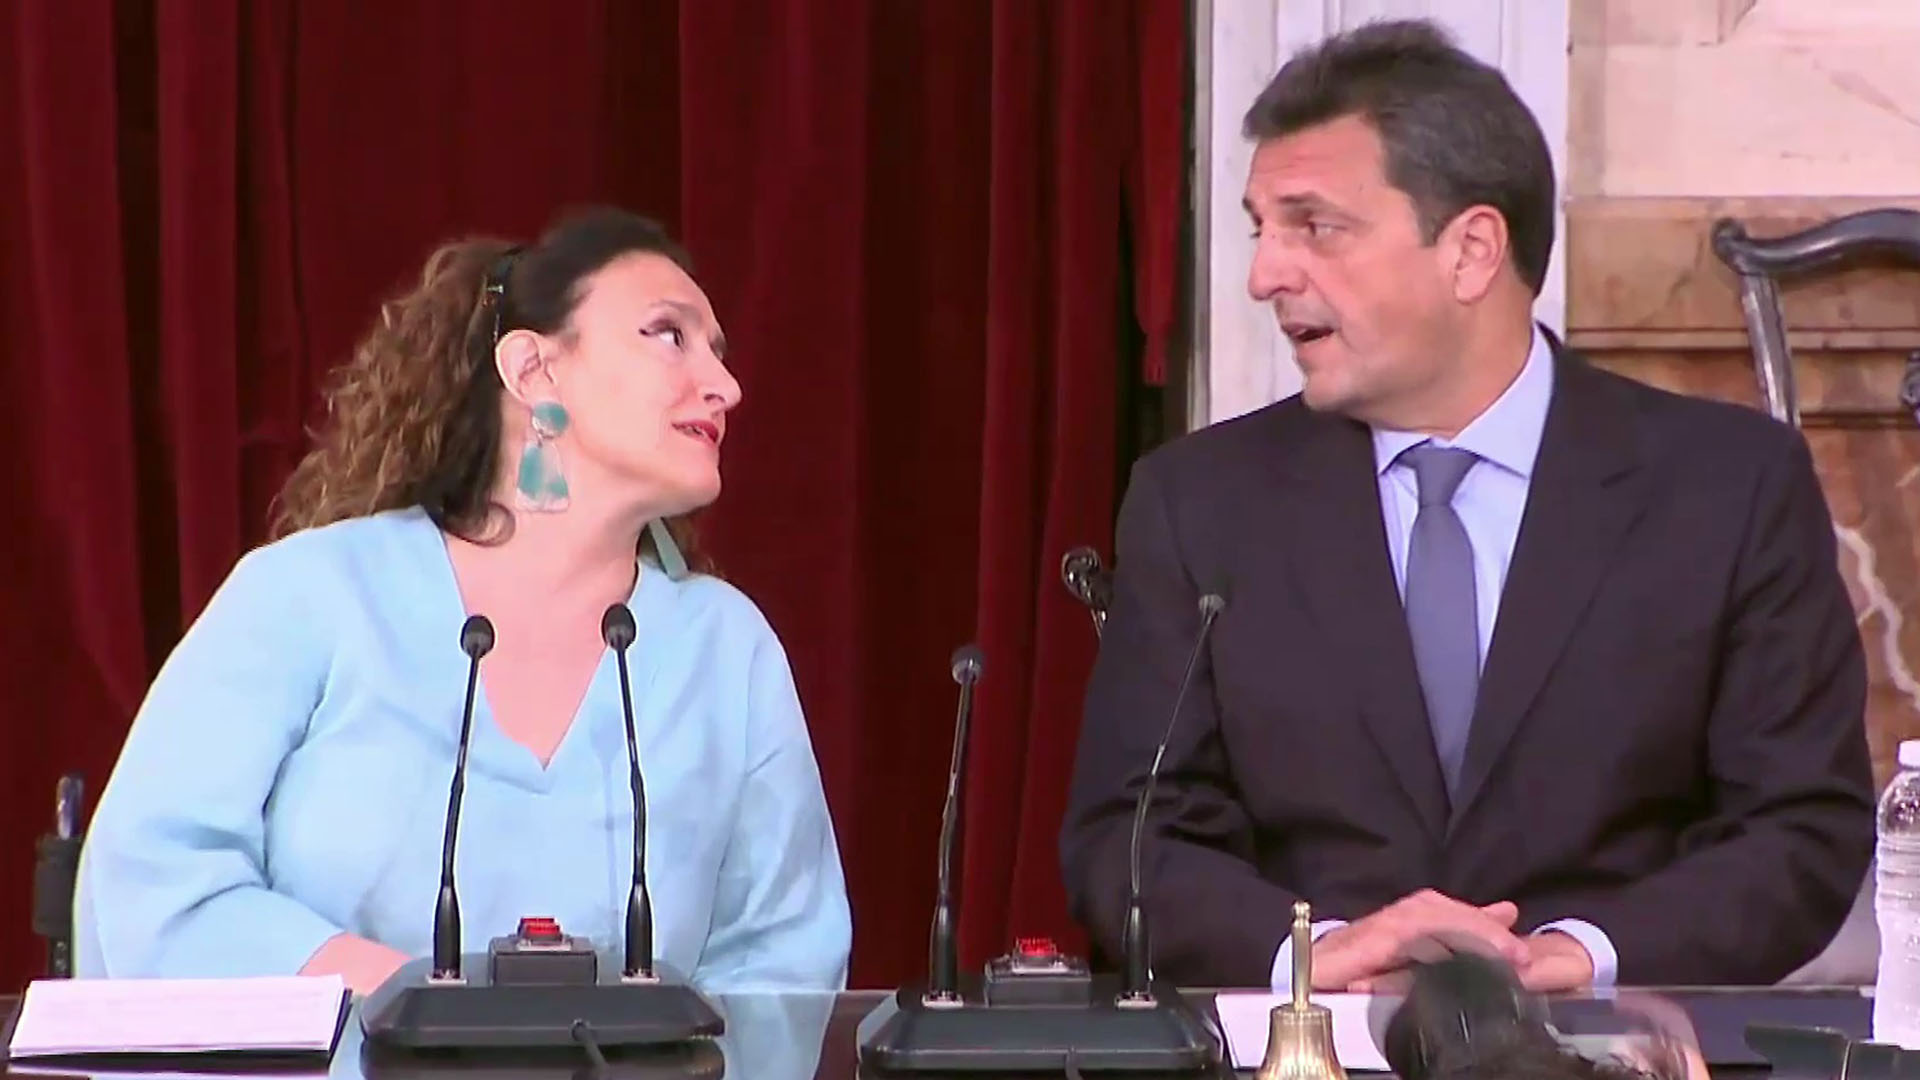 Gabriela Michetti y Sergio Massa, flamante titular de la Cámara baja